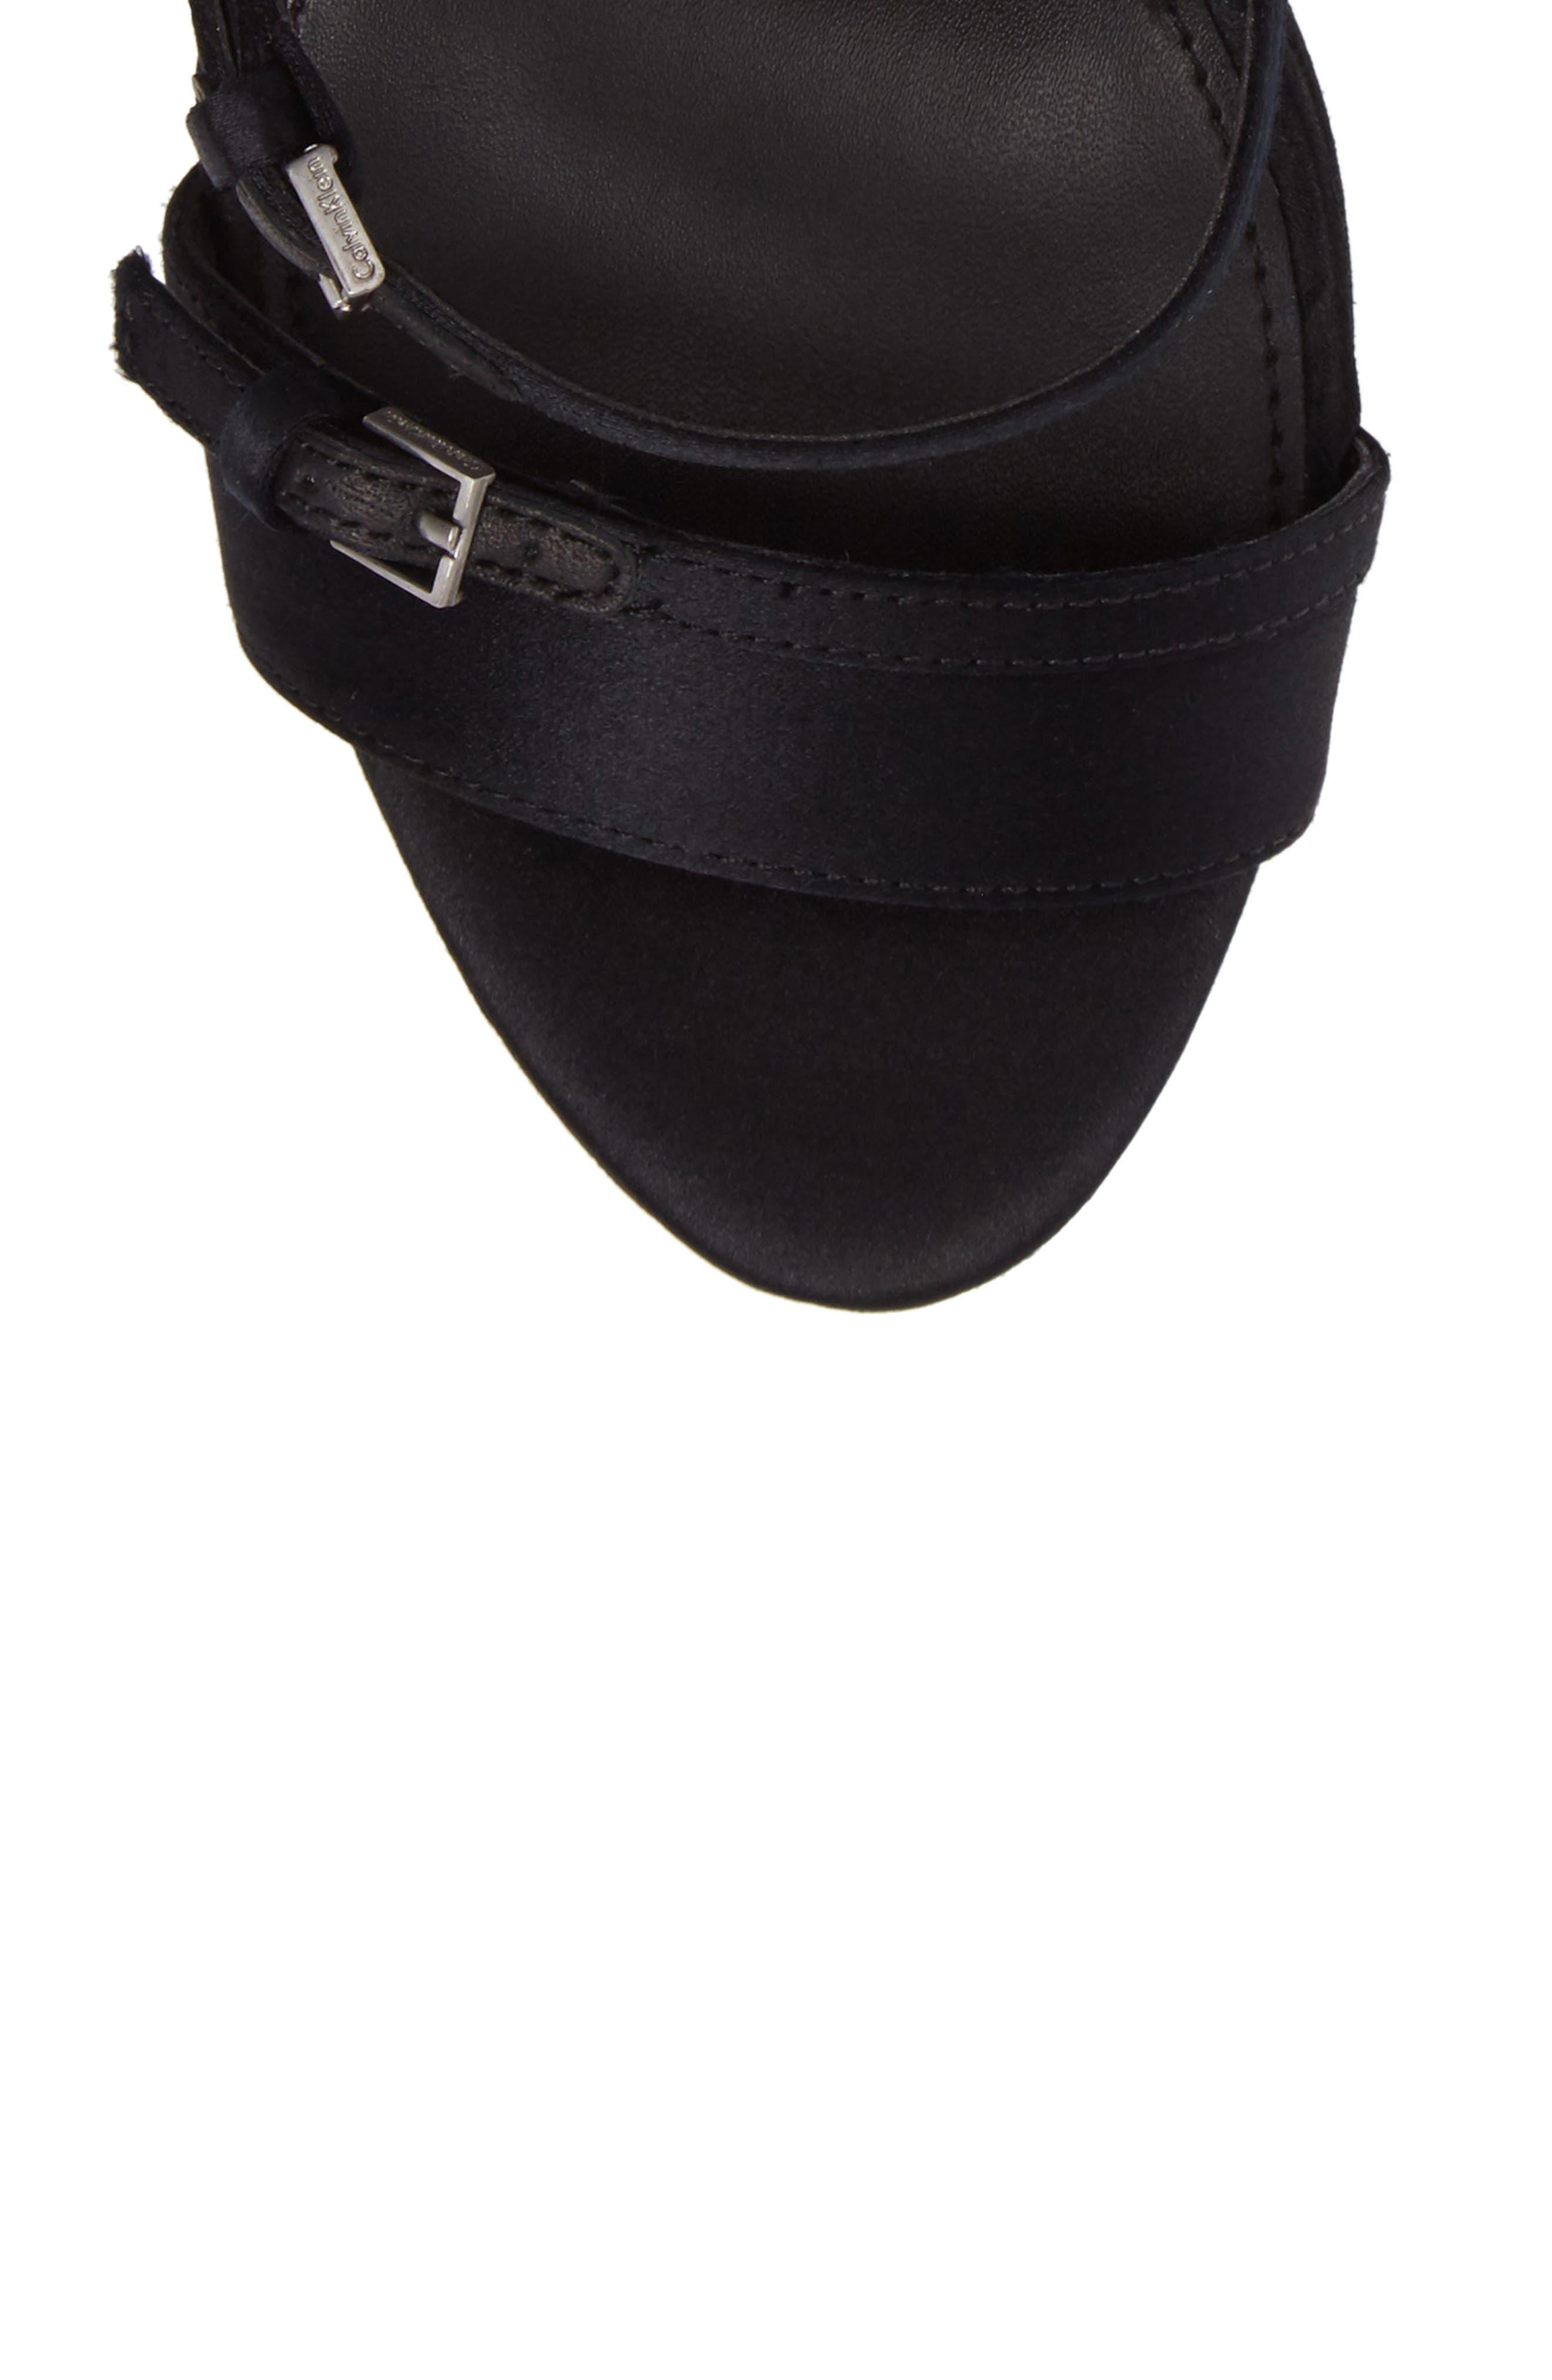 Shantell Strappy Platform Sandal,                             Alternate thumbnail 5, color,                             001